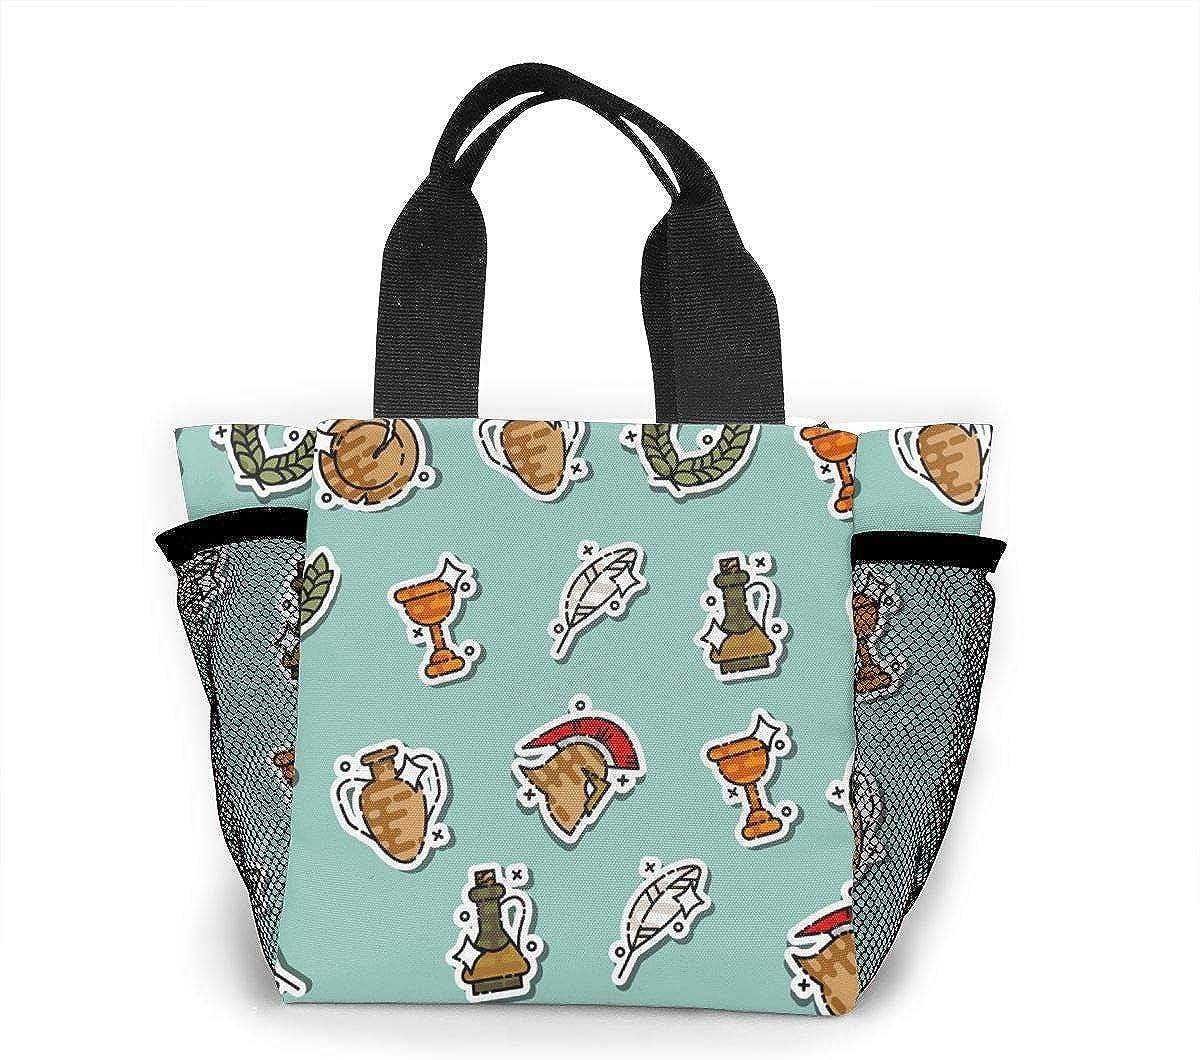 Bolso de compras reutilizable de color de la antigua Roma bolsa de supermercado de poliéster Ripstop o bolsa de almuerzo